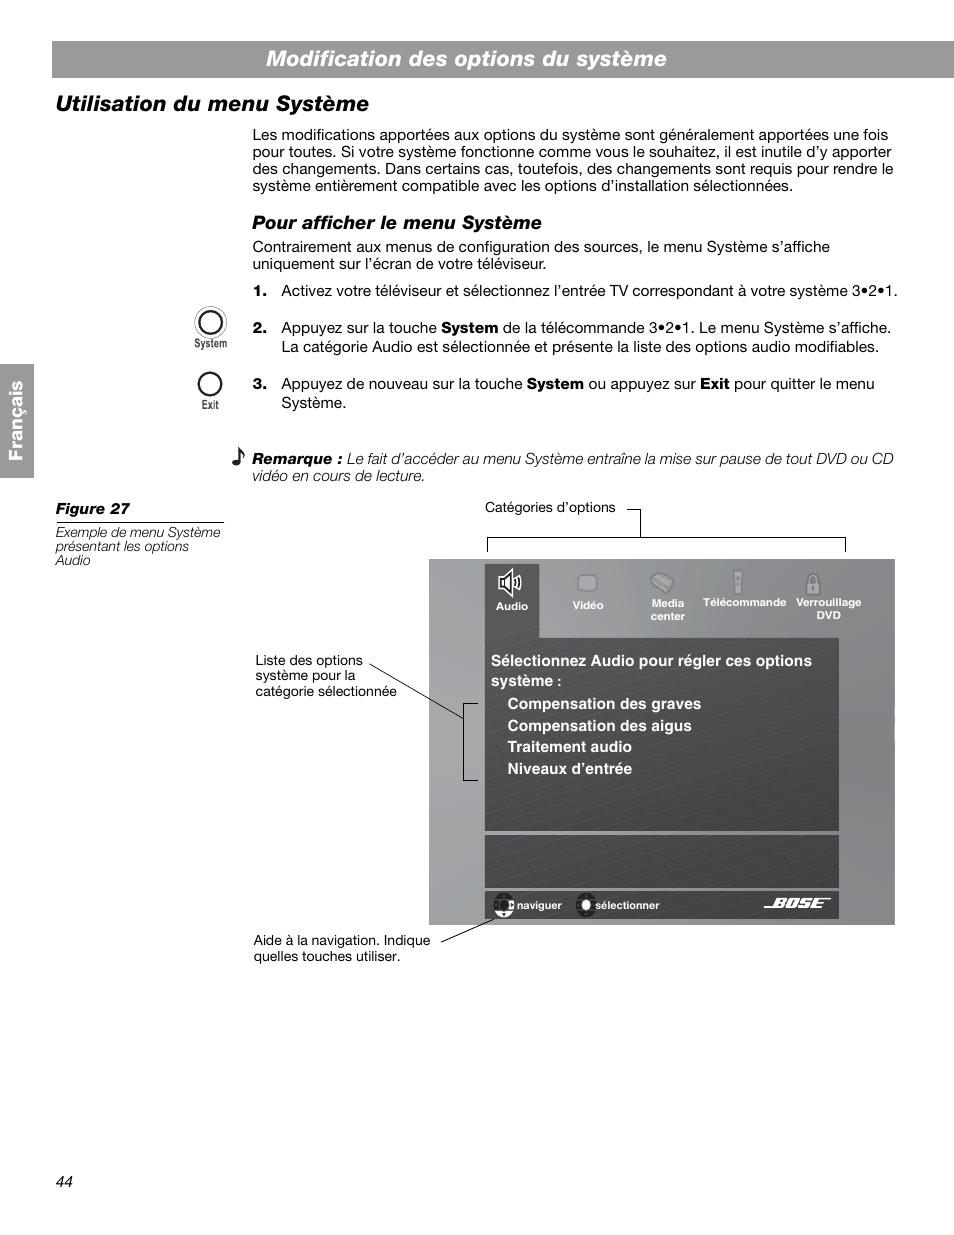 fr an a is pour afficher le menu syst me bose 3 2 1 gs series ii rh manualsdir com Bose 321 GSX Series 2 Bose 321 GSX Series 2